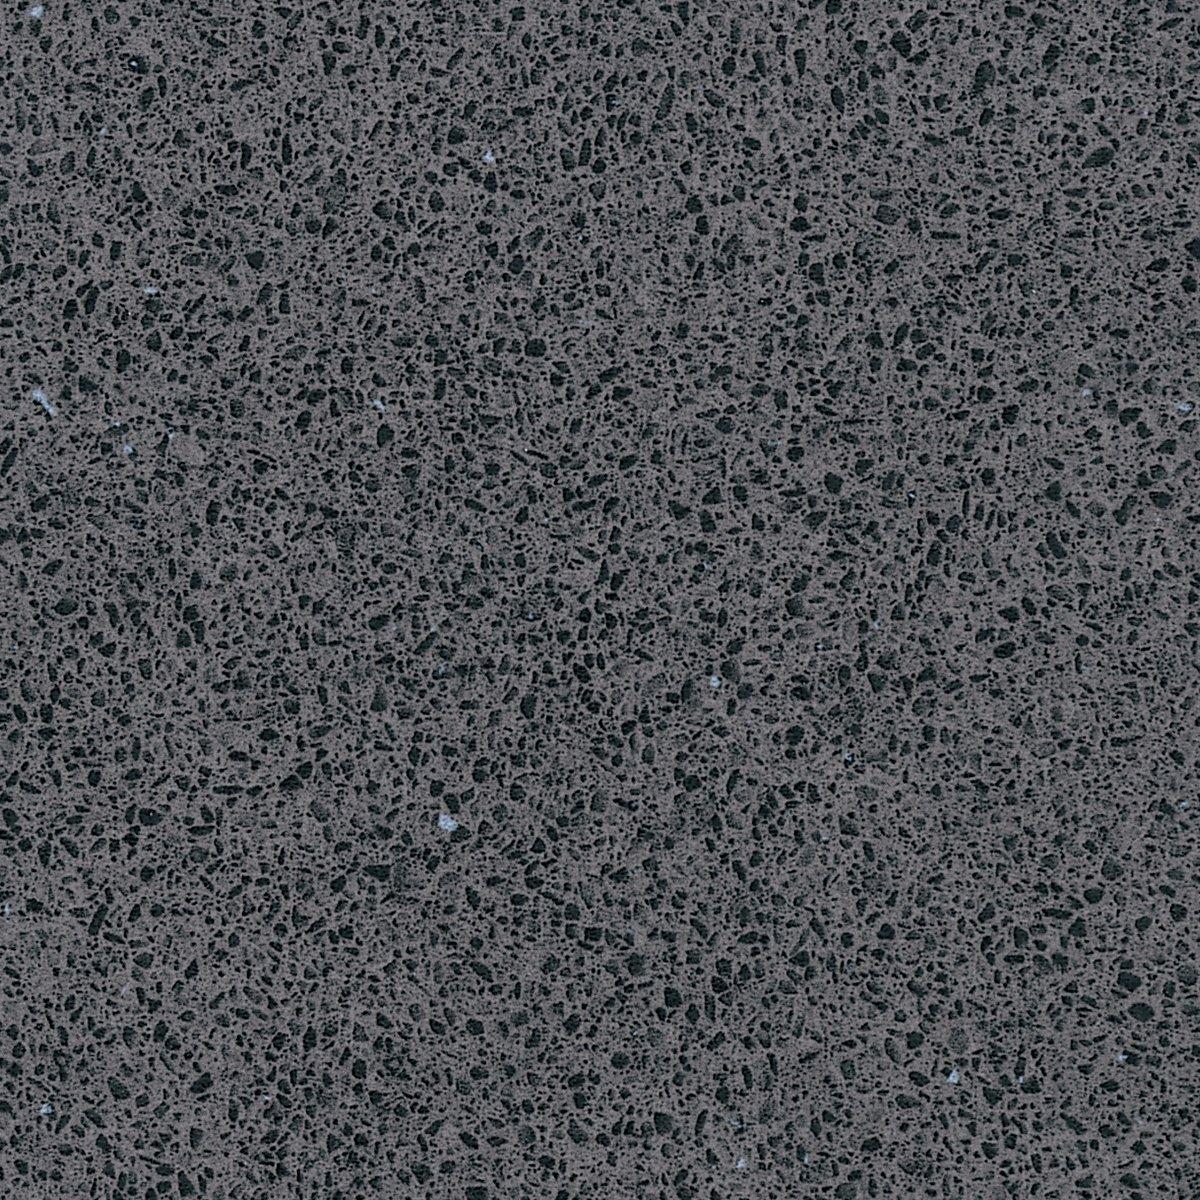 Etchings Formica Brand Laminate 036921246408000 Labrador Granite Laminate